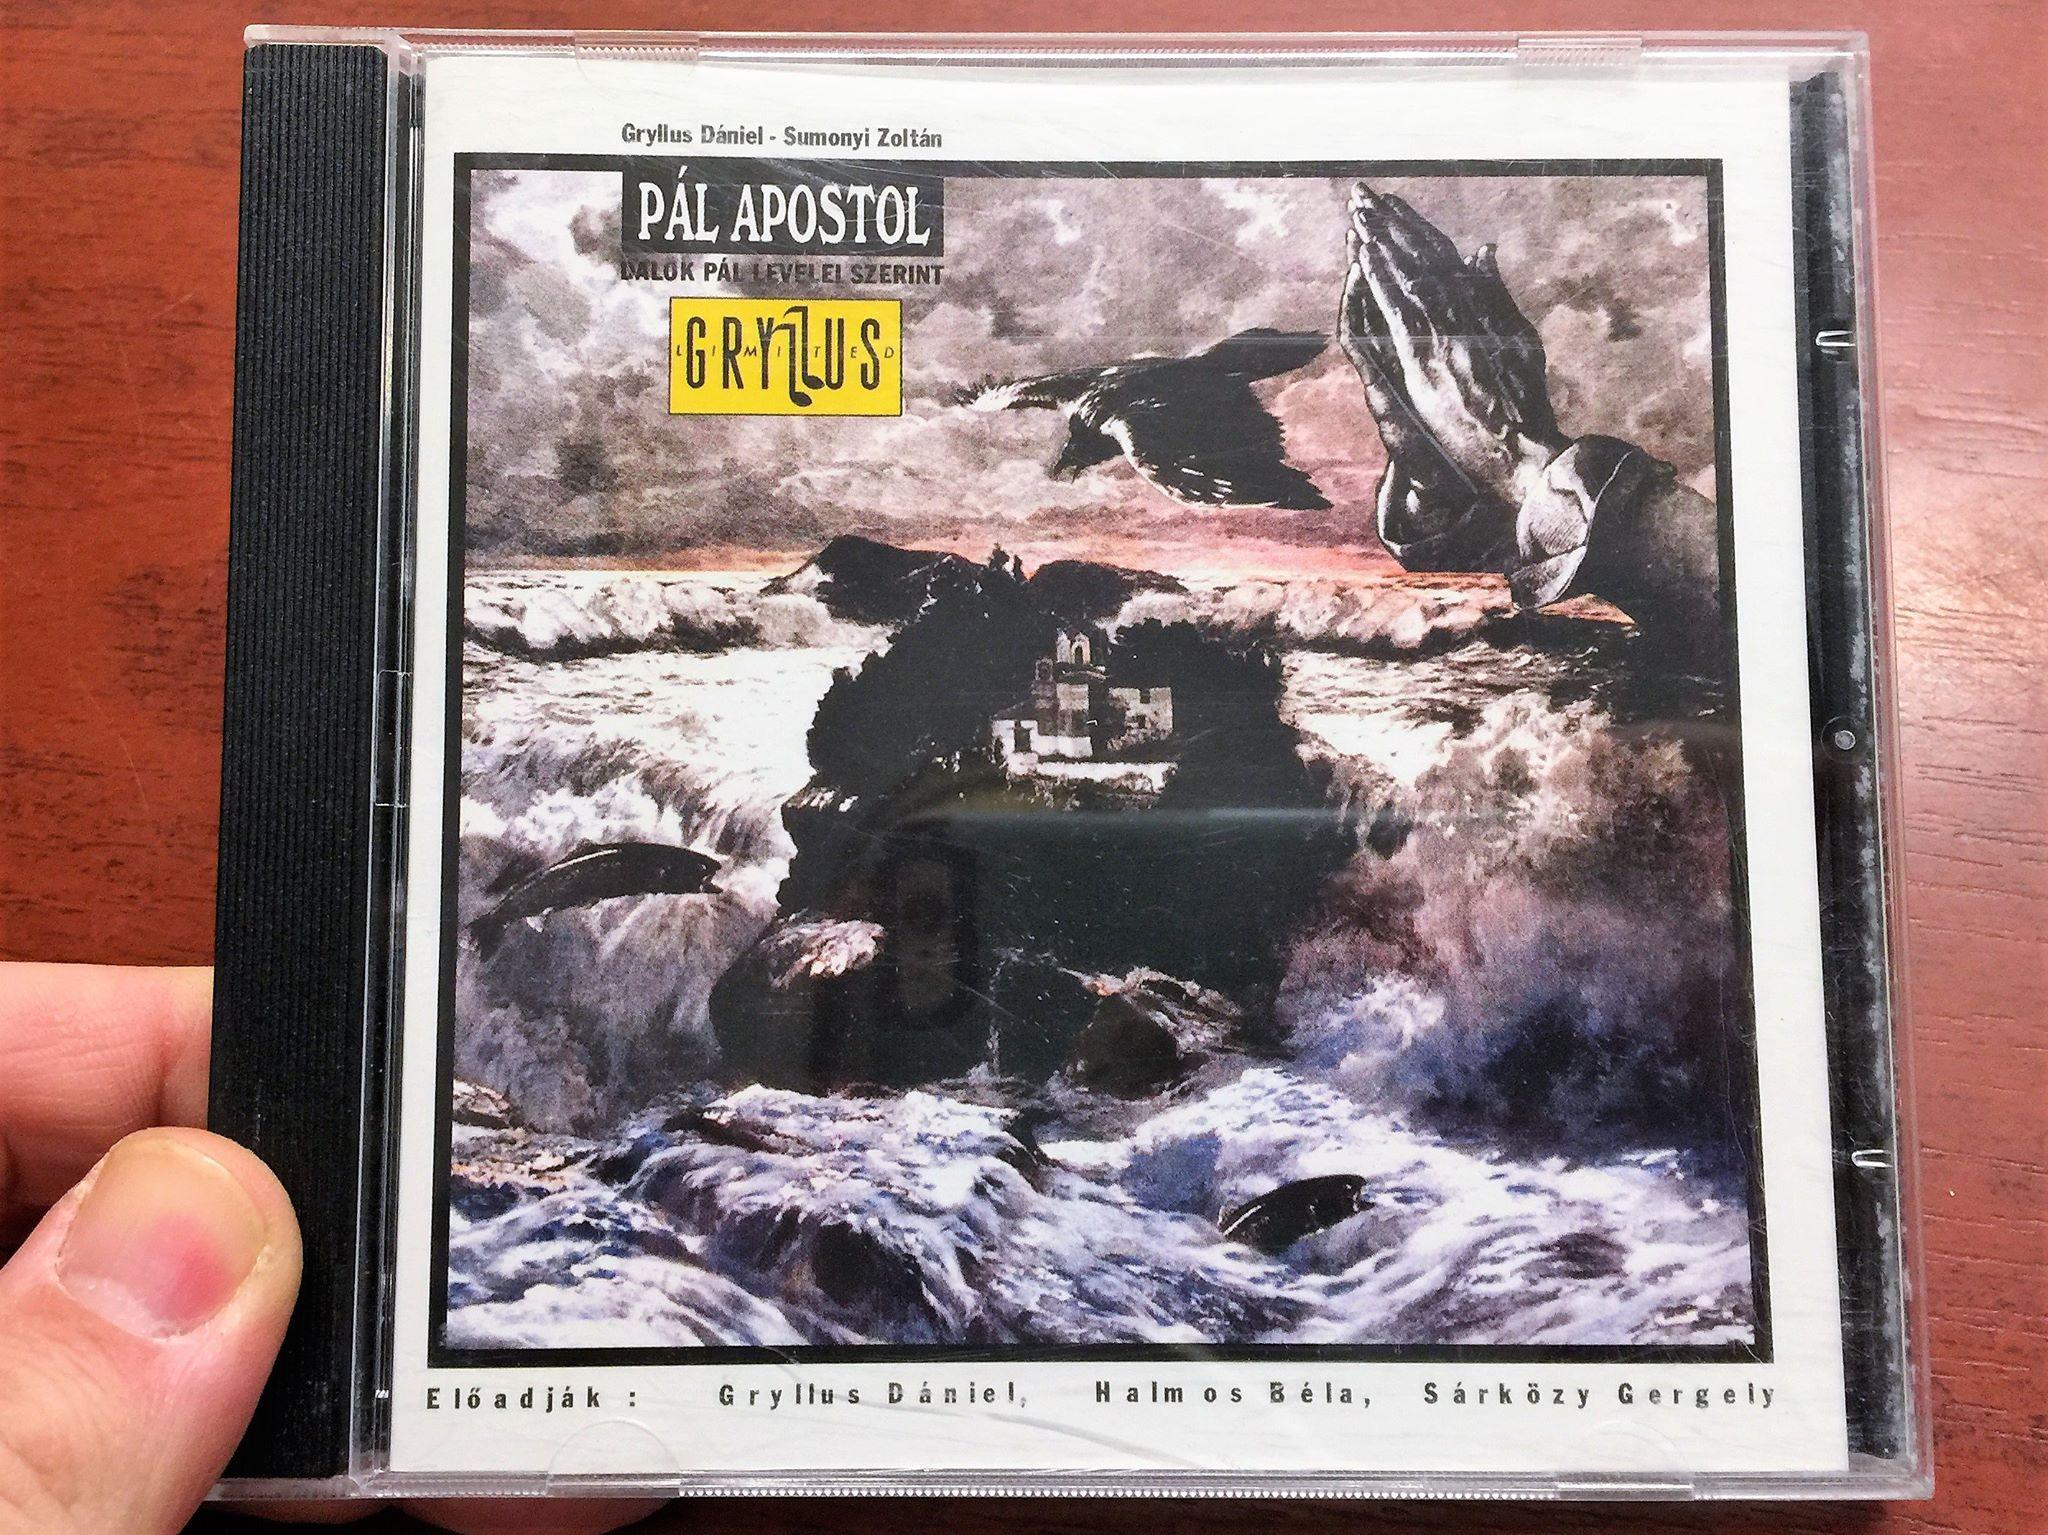 p-l-apostol-paul-the-apostle-gryllus-d-niel-music-sumonyi-zolt-n-text-hungarian-cd-1999-gcd013-1-.jpg